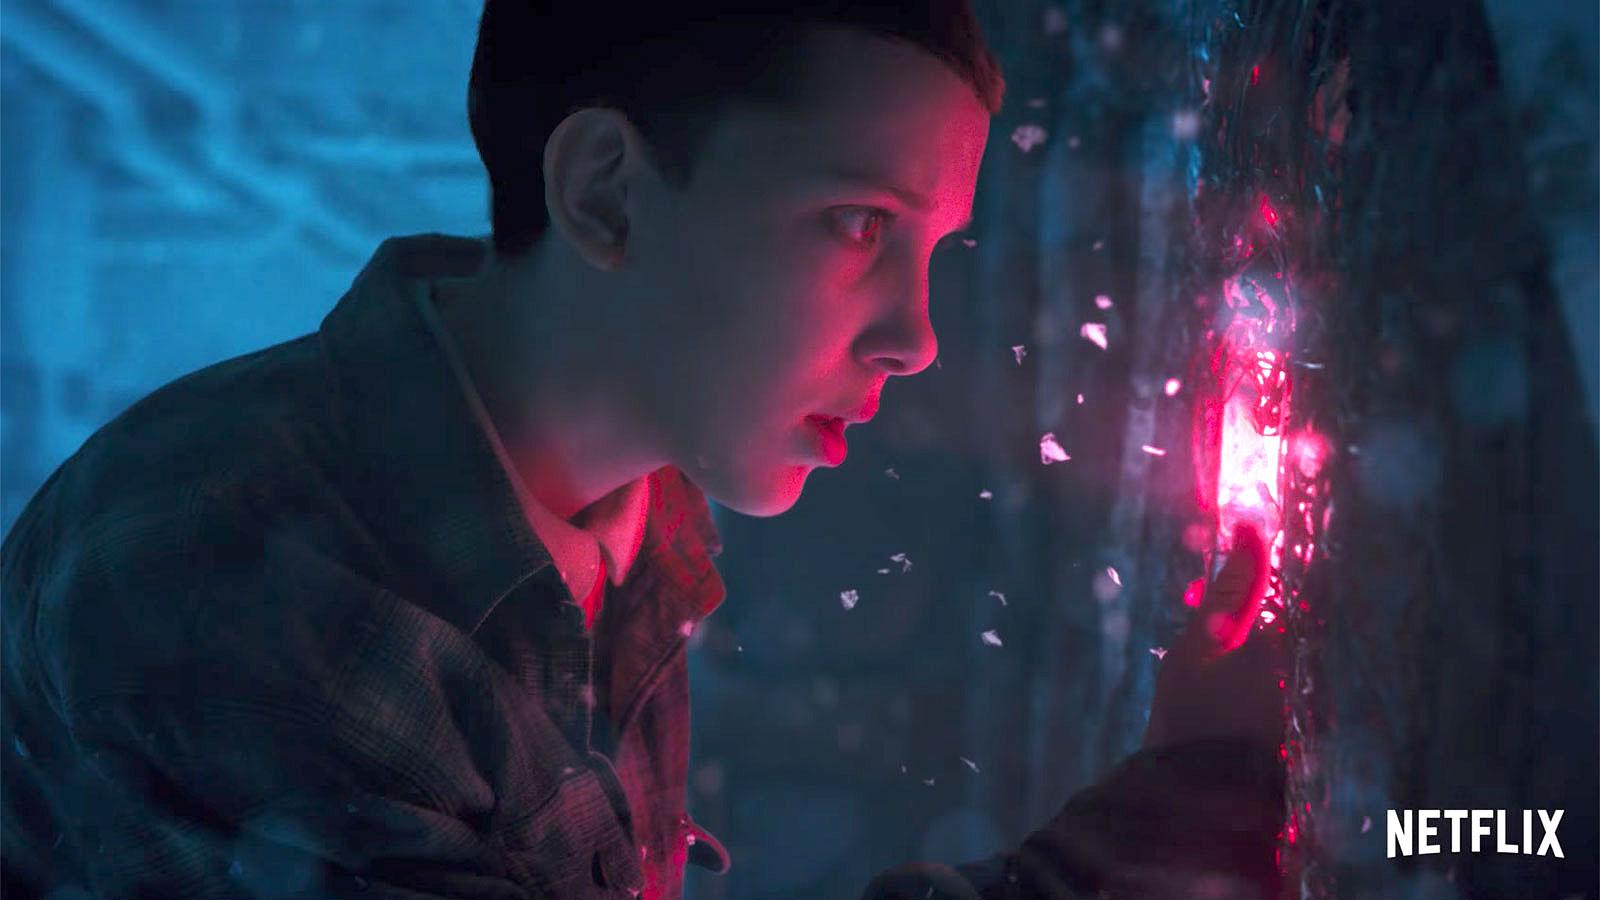 'Stranger Things 2' Reviews Praise a Darker, More ...